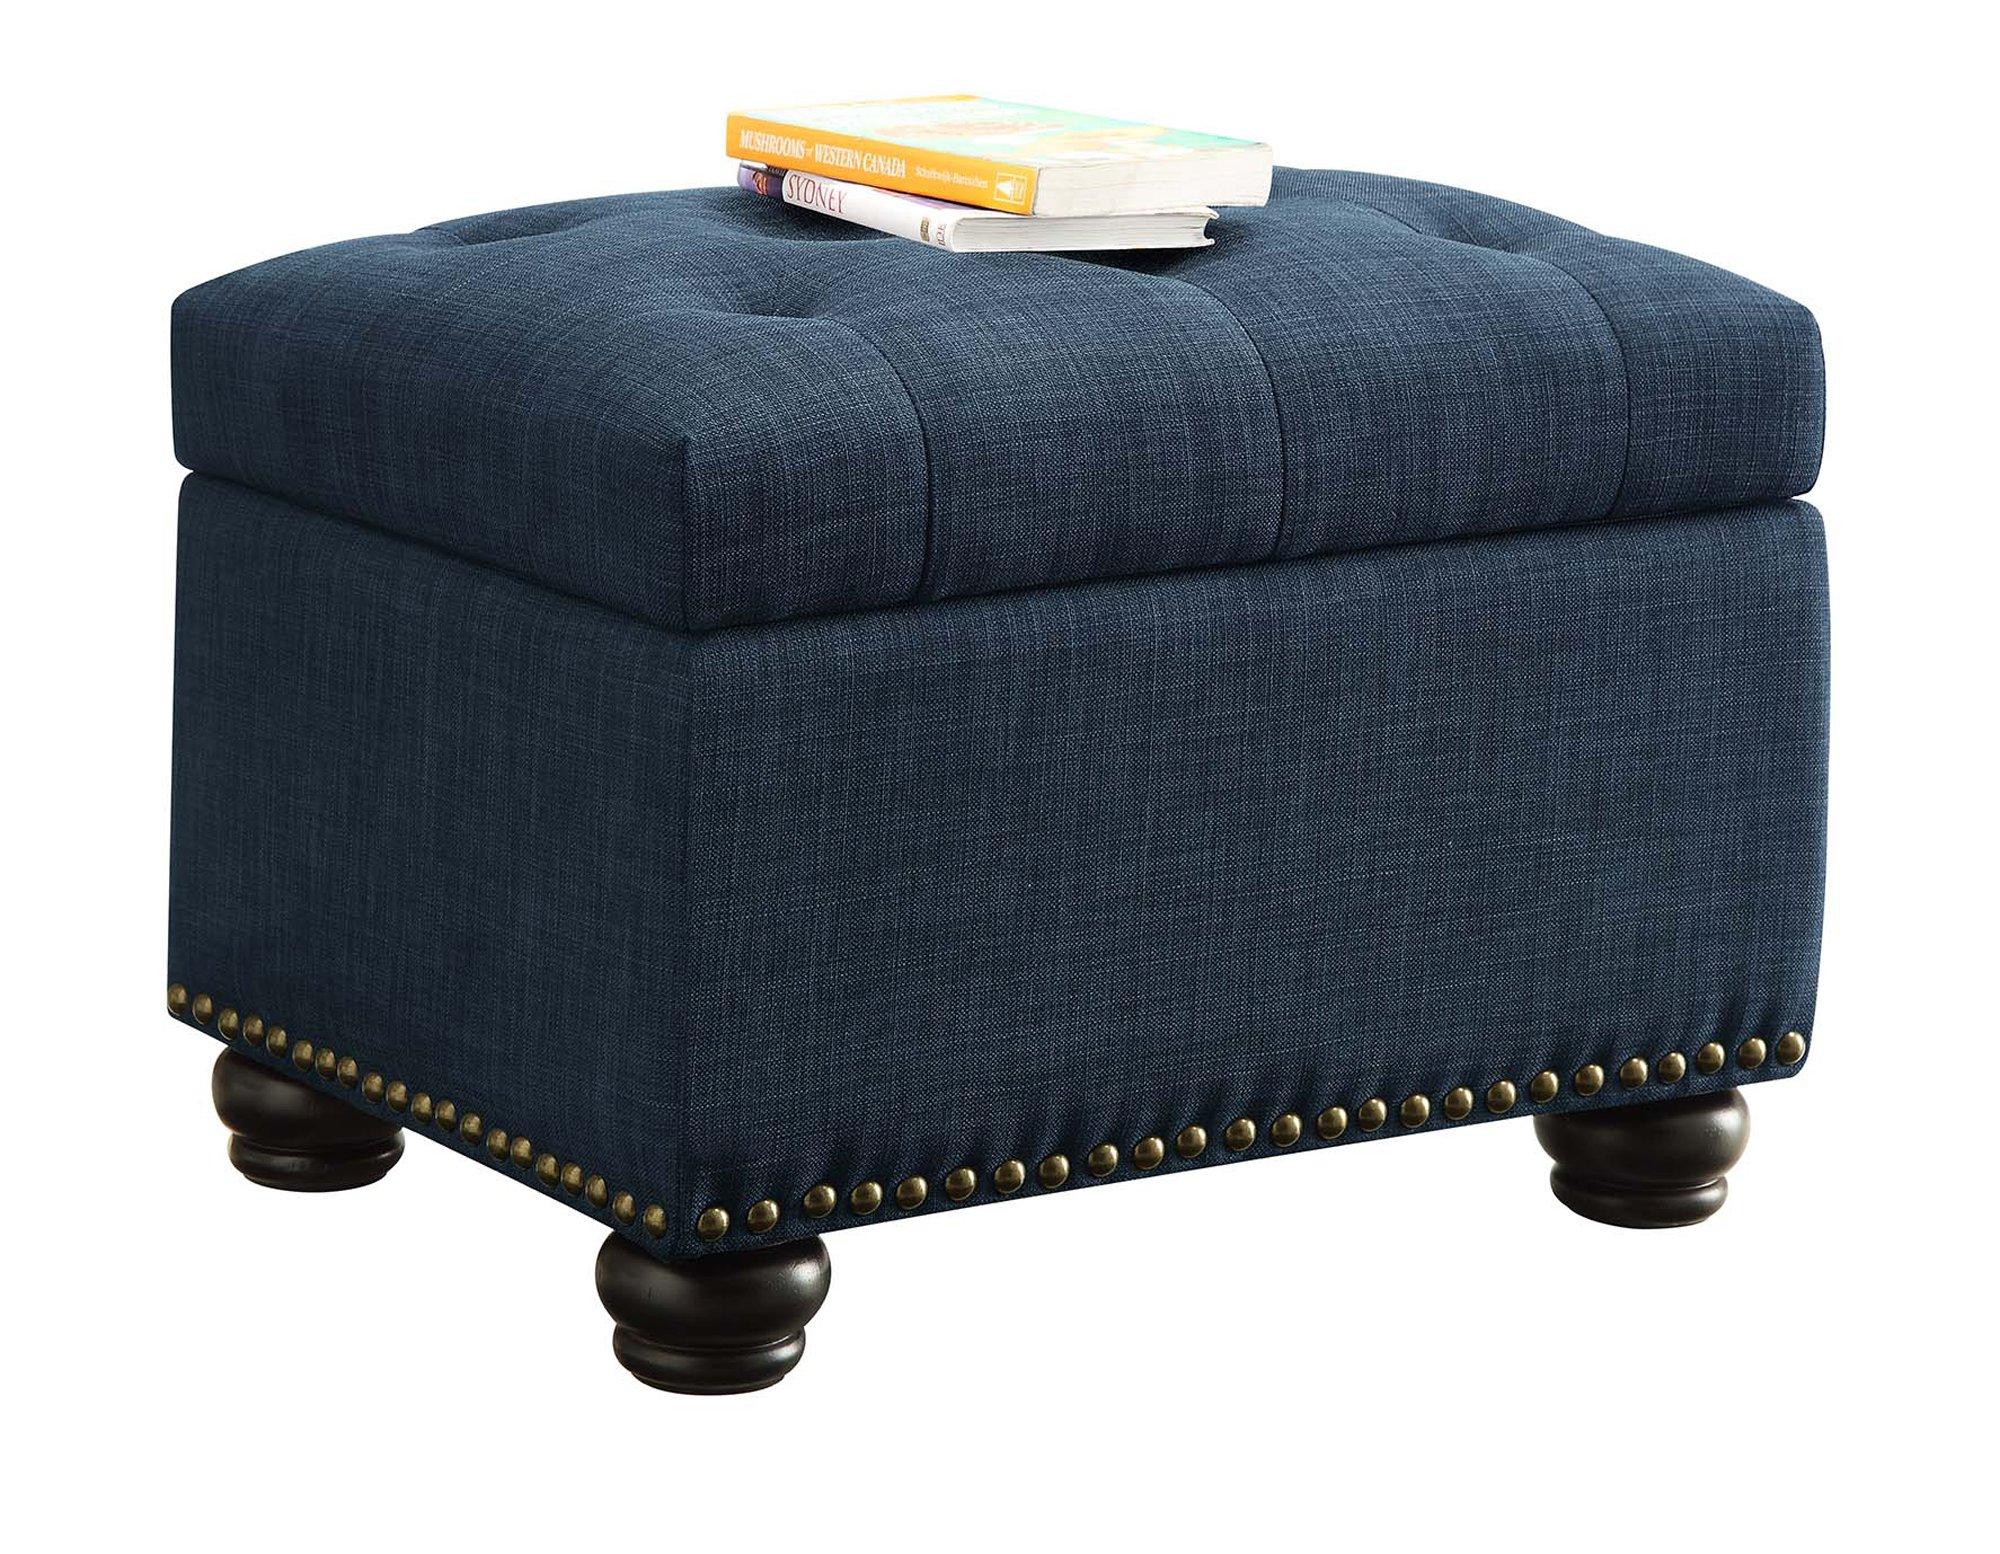 Convenience Concepts Designs4Comfort 5th Avenue Storage Ottoman, Blue by Convenience Concepts (Image #2)